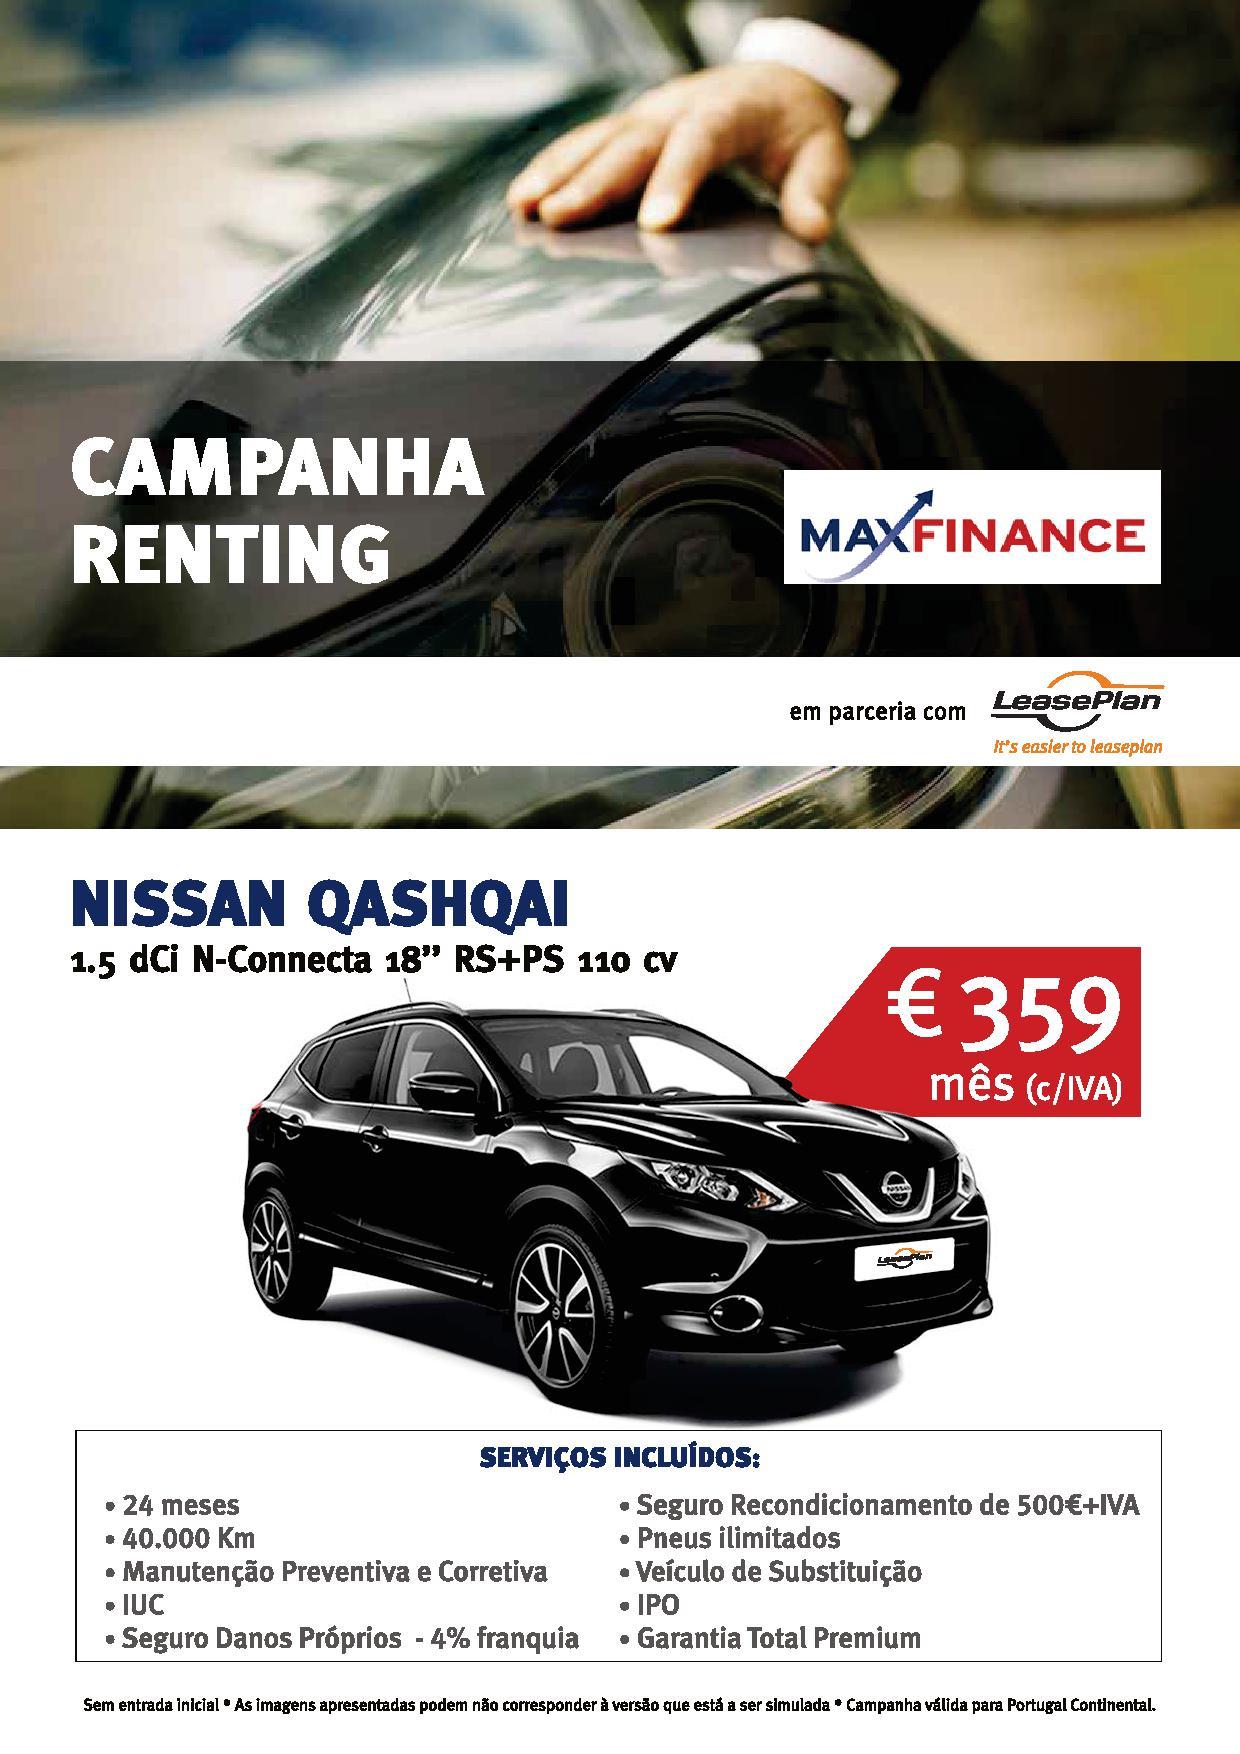 monofolha_maxfinance_qashqai